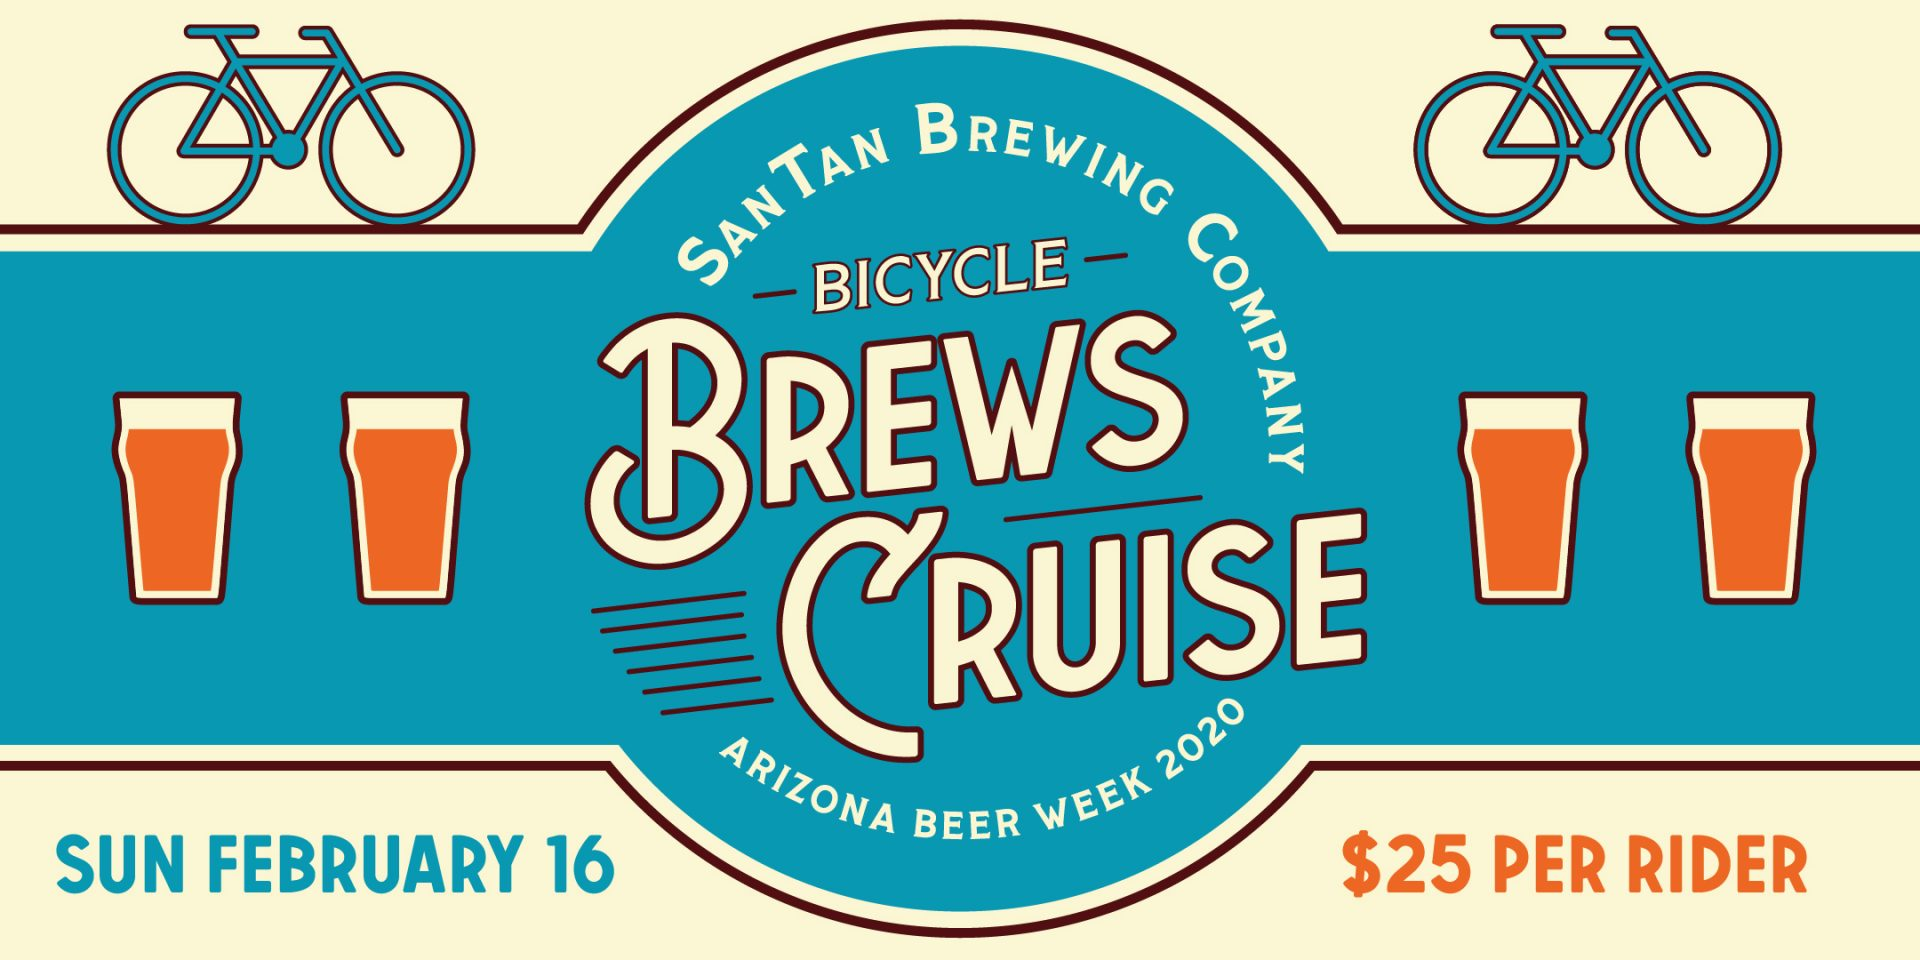 Bicycle Brews Cruise – SanTan Brewing Company